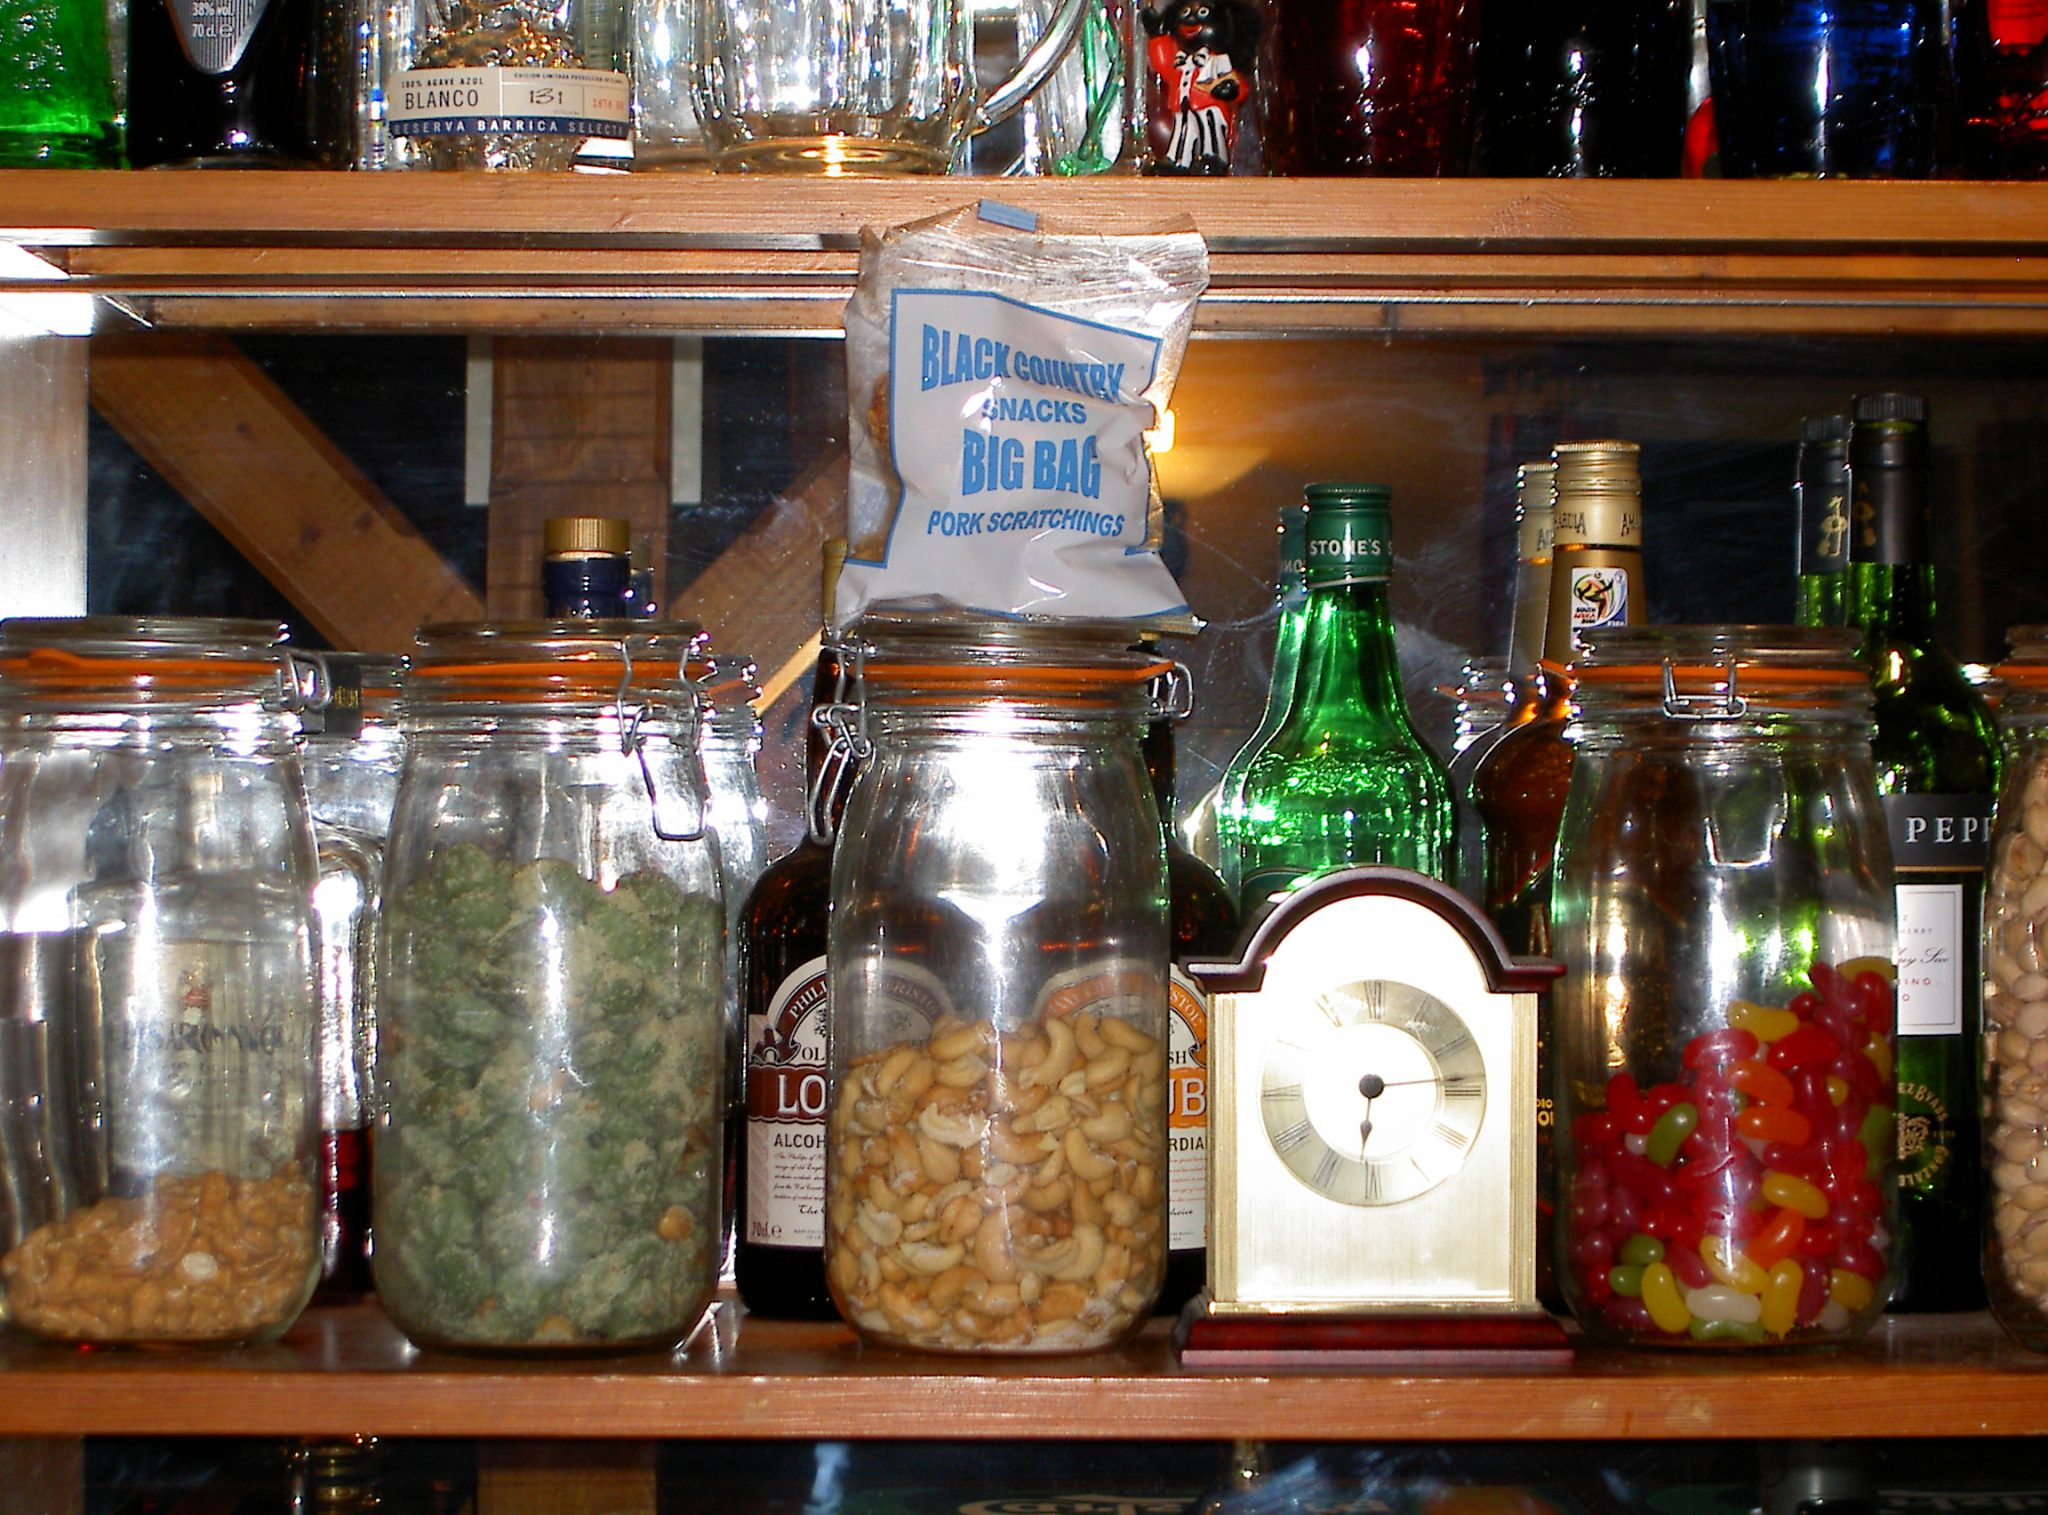 The Rydon Inn Holsworthy Devon Pub Review2 - The Rydon Inn, Holsworthy, Devon - Pub Review